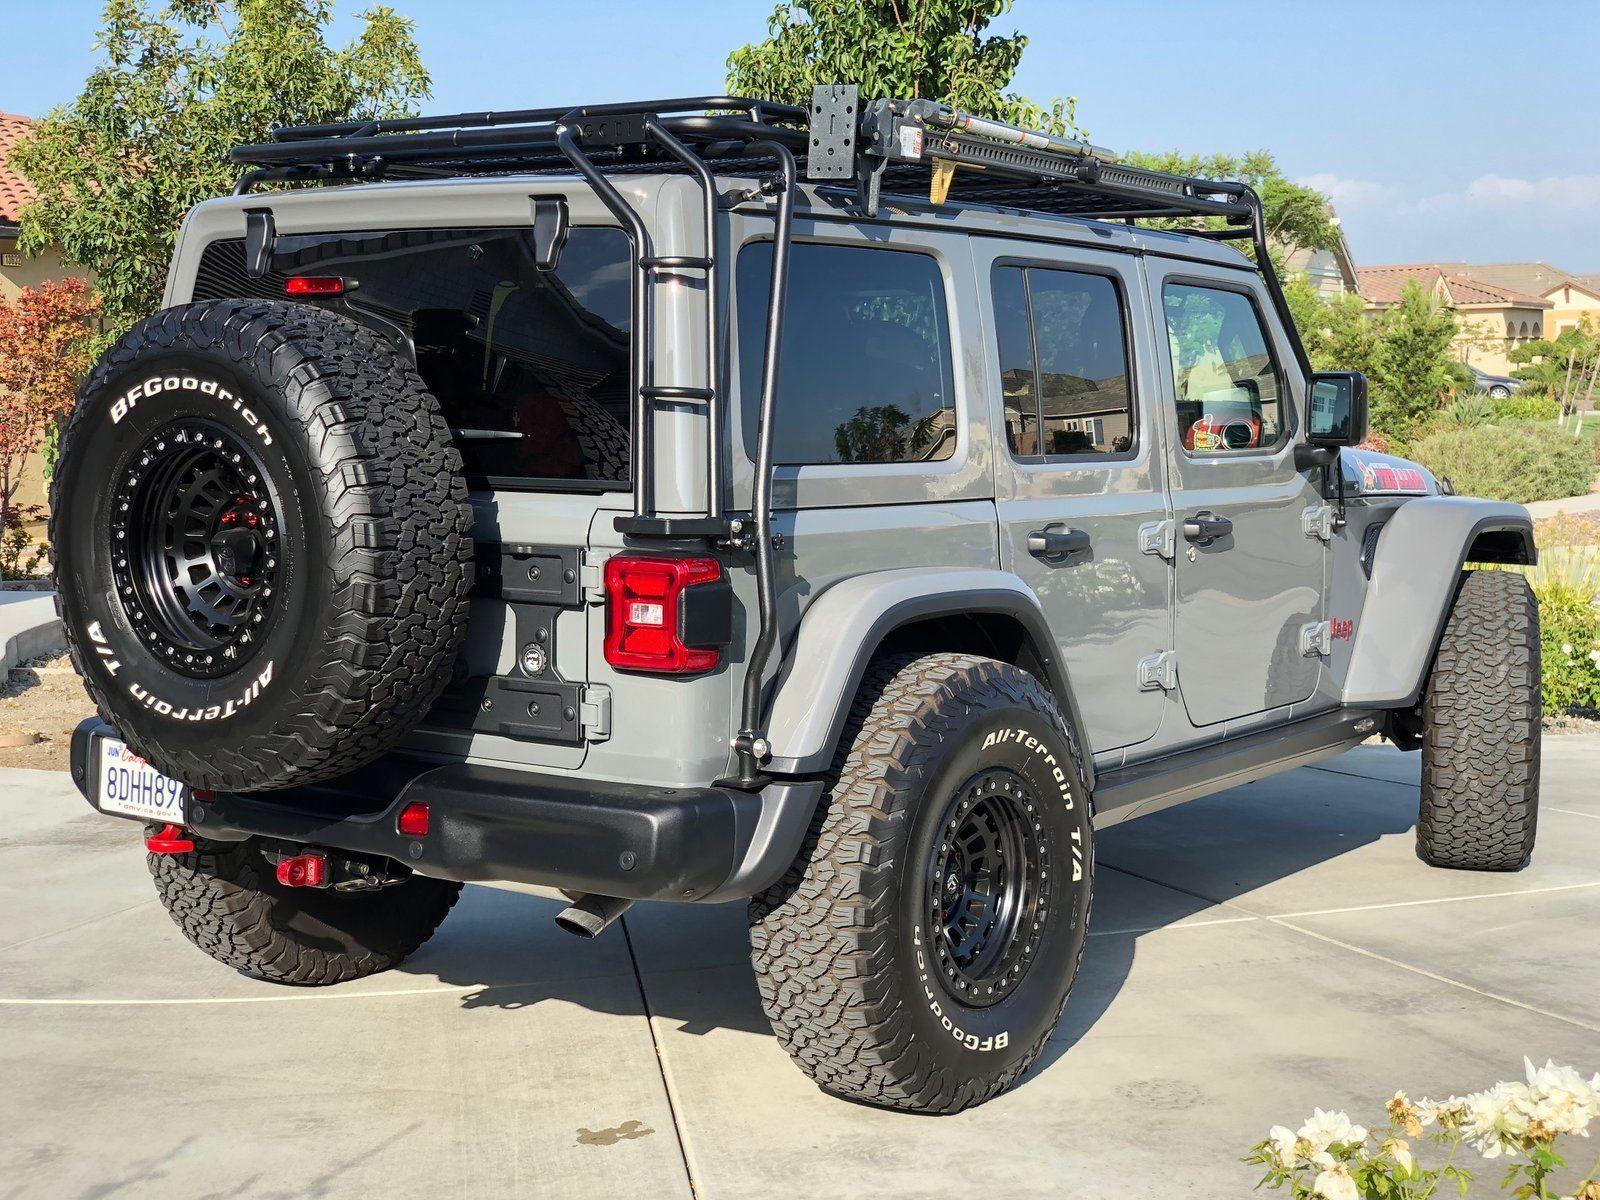 Gobi Stealth Rack Arrived And Installed Pics 2018 Jeep Wrangler Forums Jl Jlu Rubicon Sahara In 2020 Jeep Wrangler Camper Jeep Wrangler Forum Jeep Wrangler